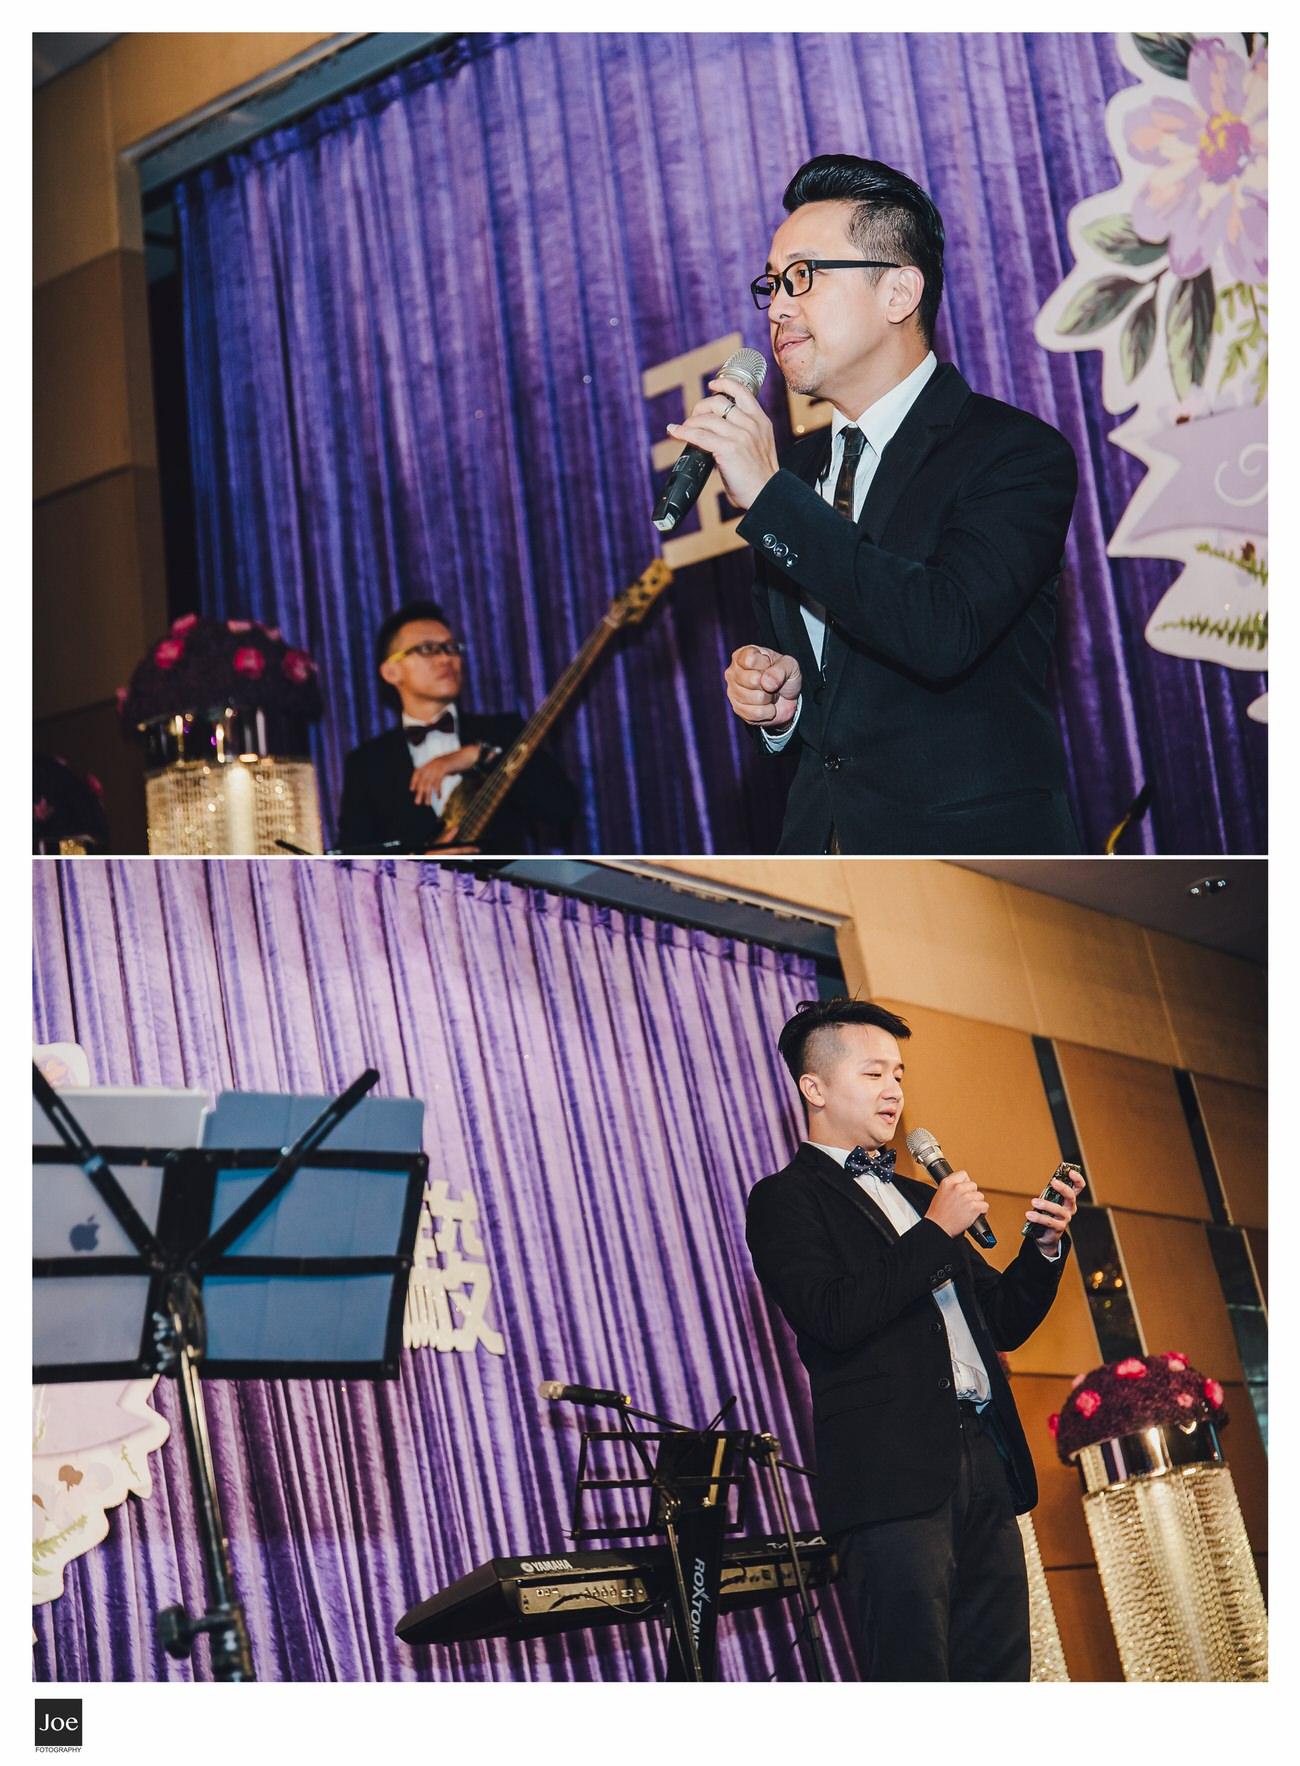 grand-hilai-hotel-wedding-daniel-yvette-joe-fotography-124.jpg